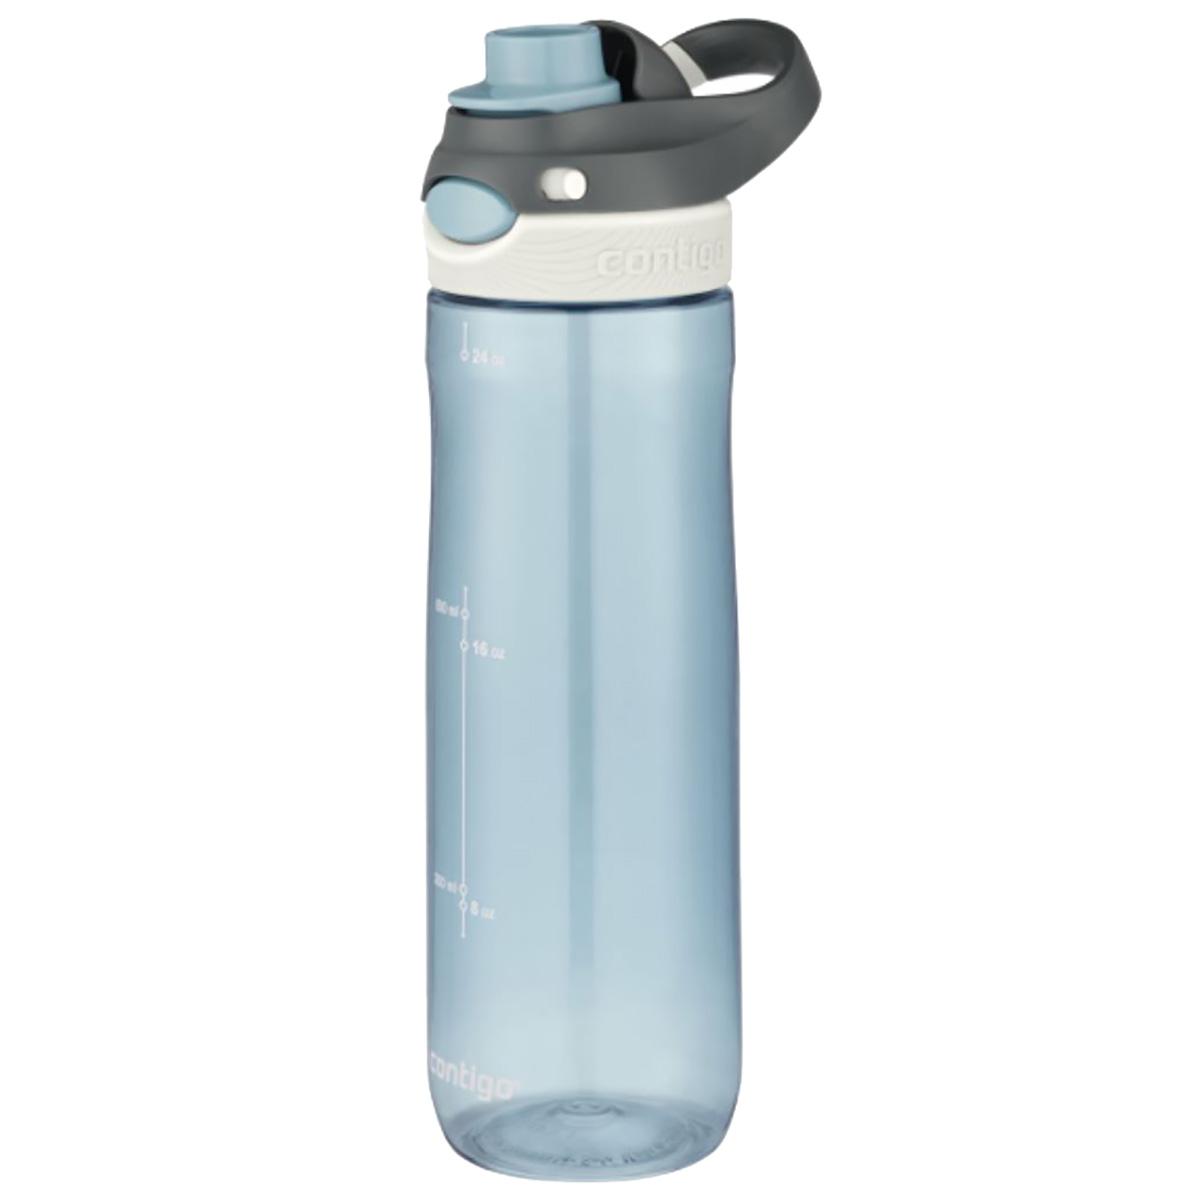 Contigo-24-oz-Chug-Autospout-Leak-Proof-Water-Bottle miniatuur 23